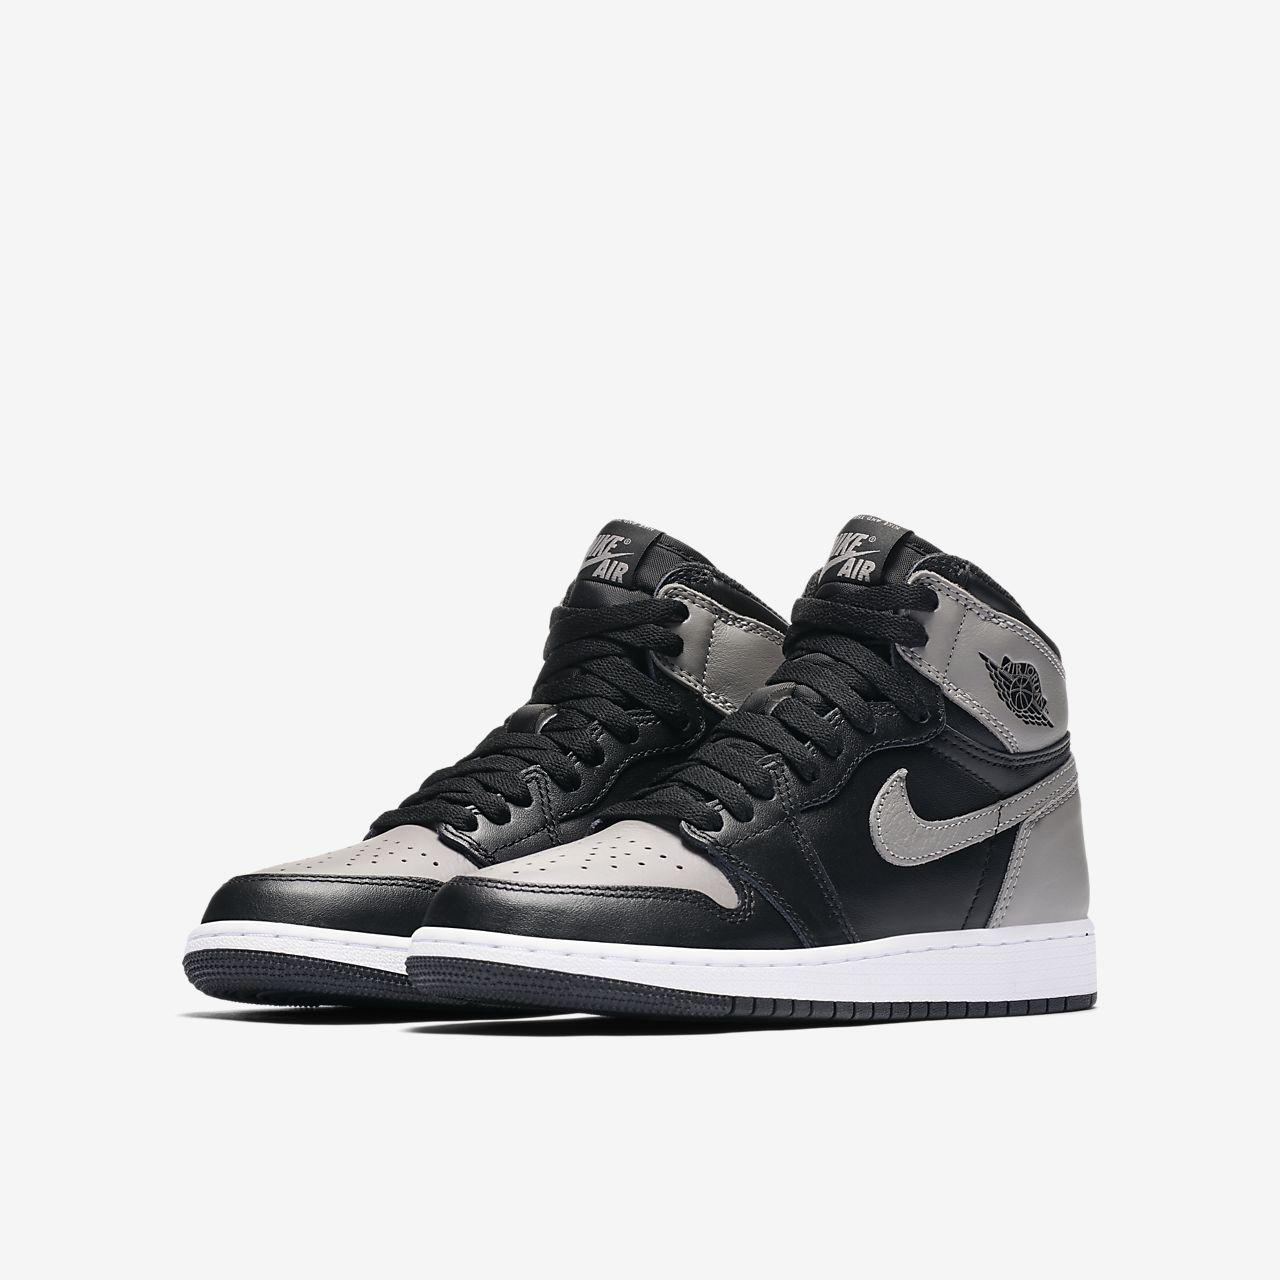 Big Kids Nike Air Jordans - Musée des impressionnismes Giverny c285fd006f3f